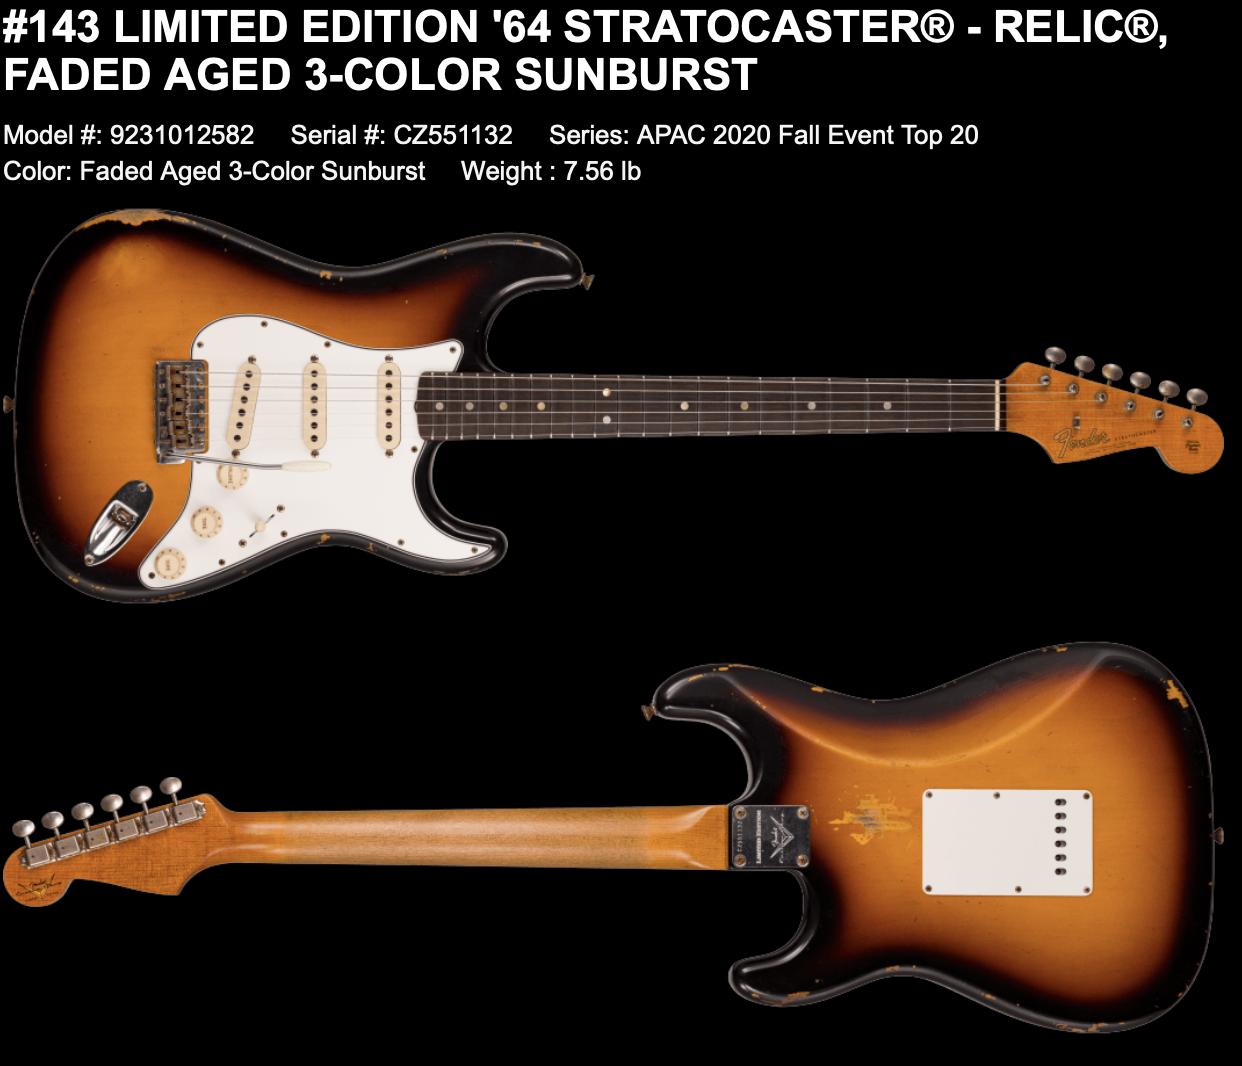 (PRE-ORDER) Fender Custom Shop Limited LIMITED EDITION '64 STRATOCASTER RELIC FADED AGED 3-COLOR SUNBURST